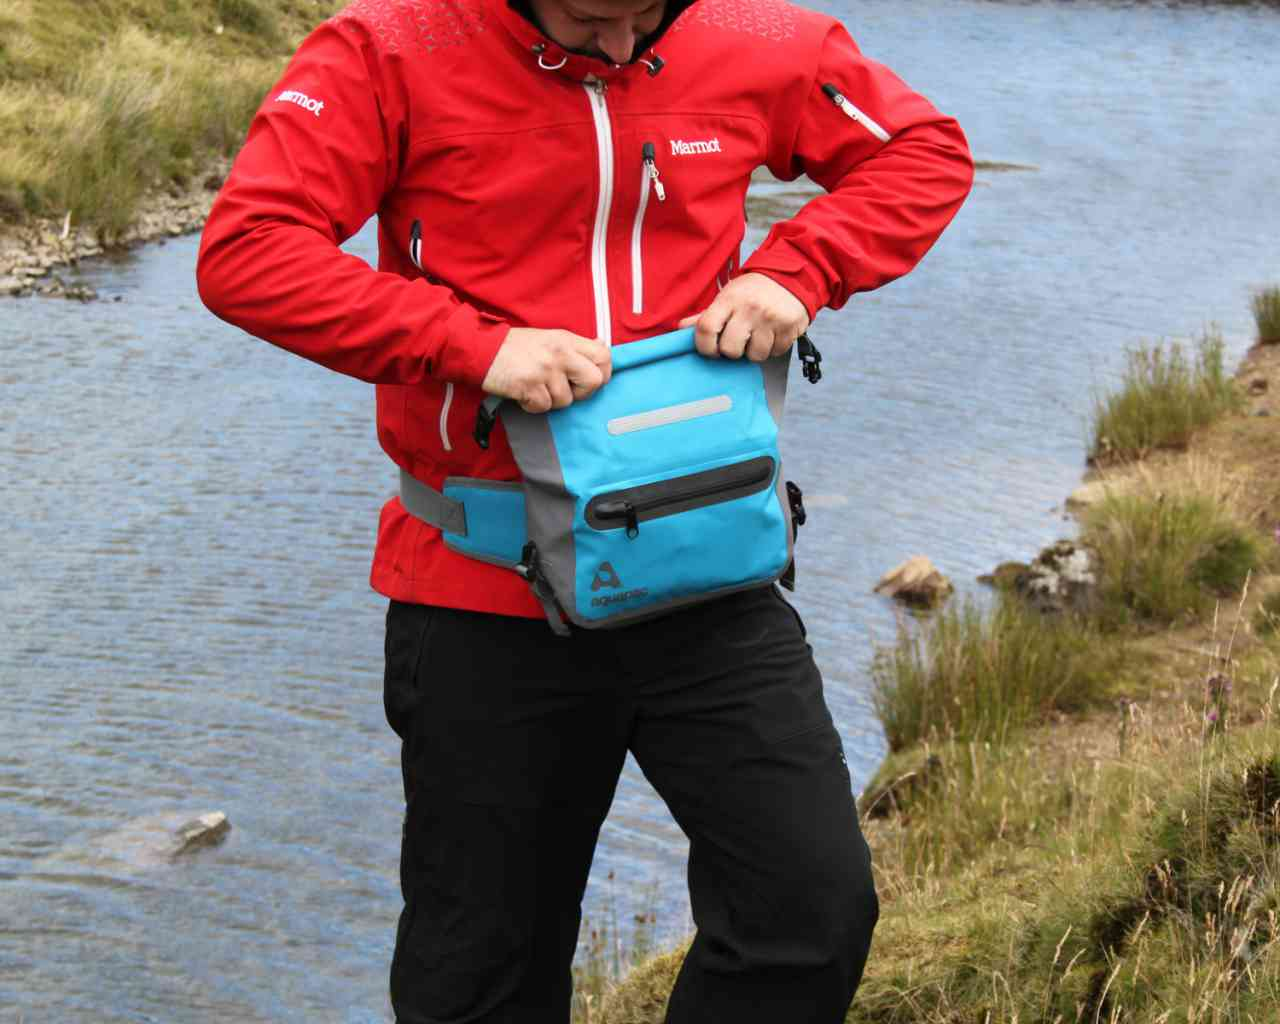 Водонепроницаемый чехол для документов - Aquapac 822. Aquapac - №1 в мире водонепроницаемых чехлов и сумок. Фото 6